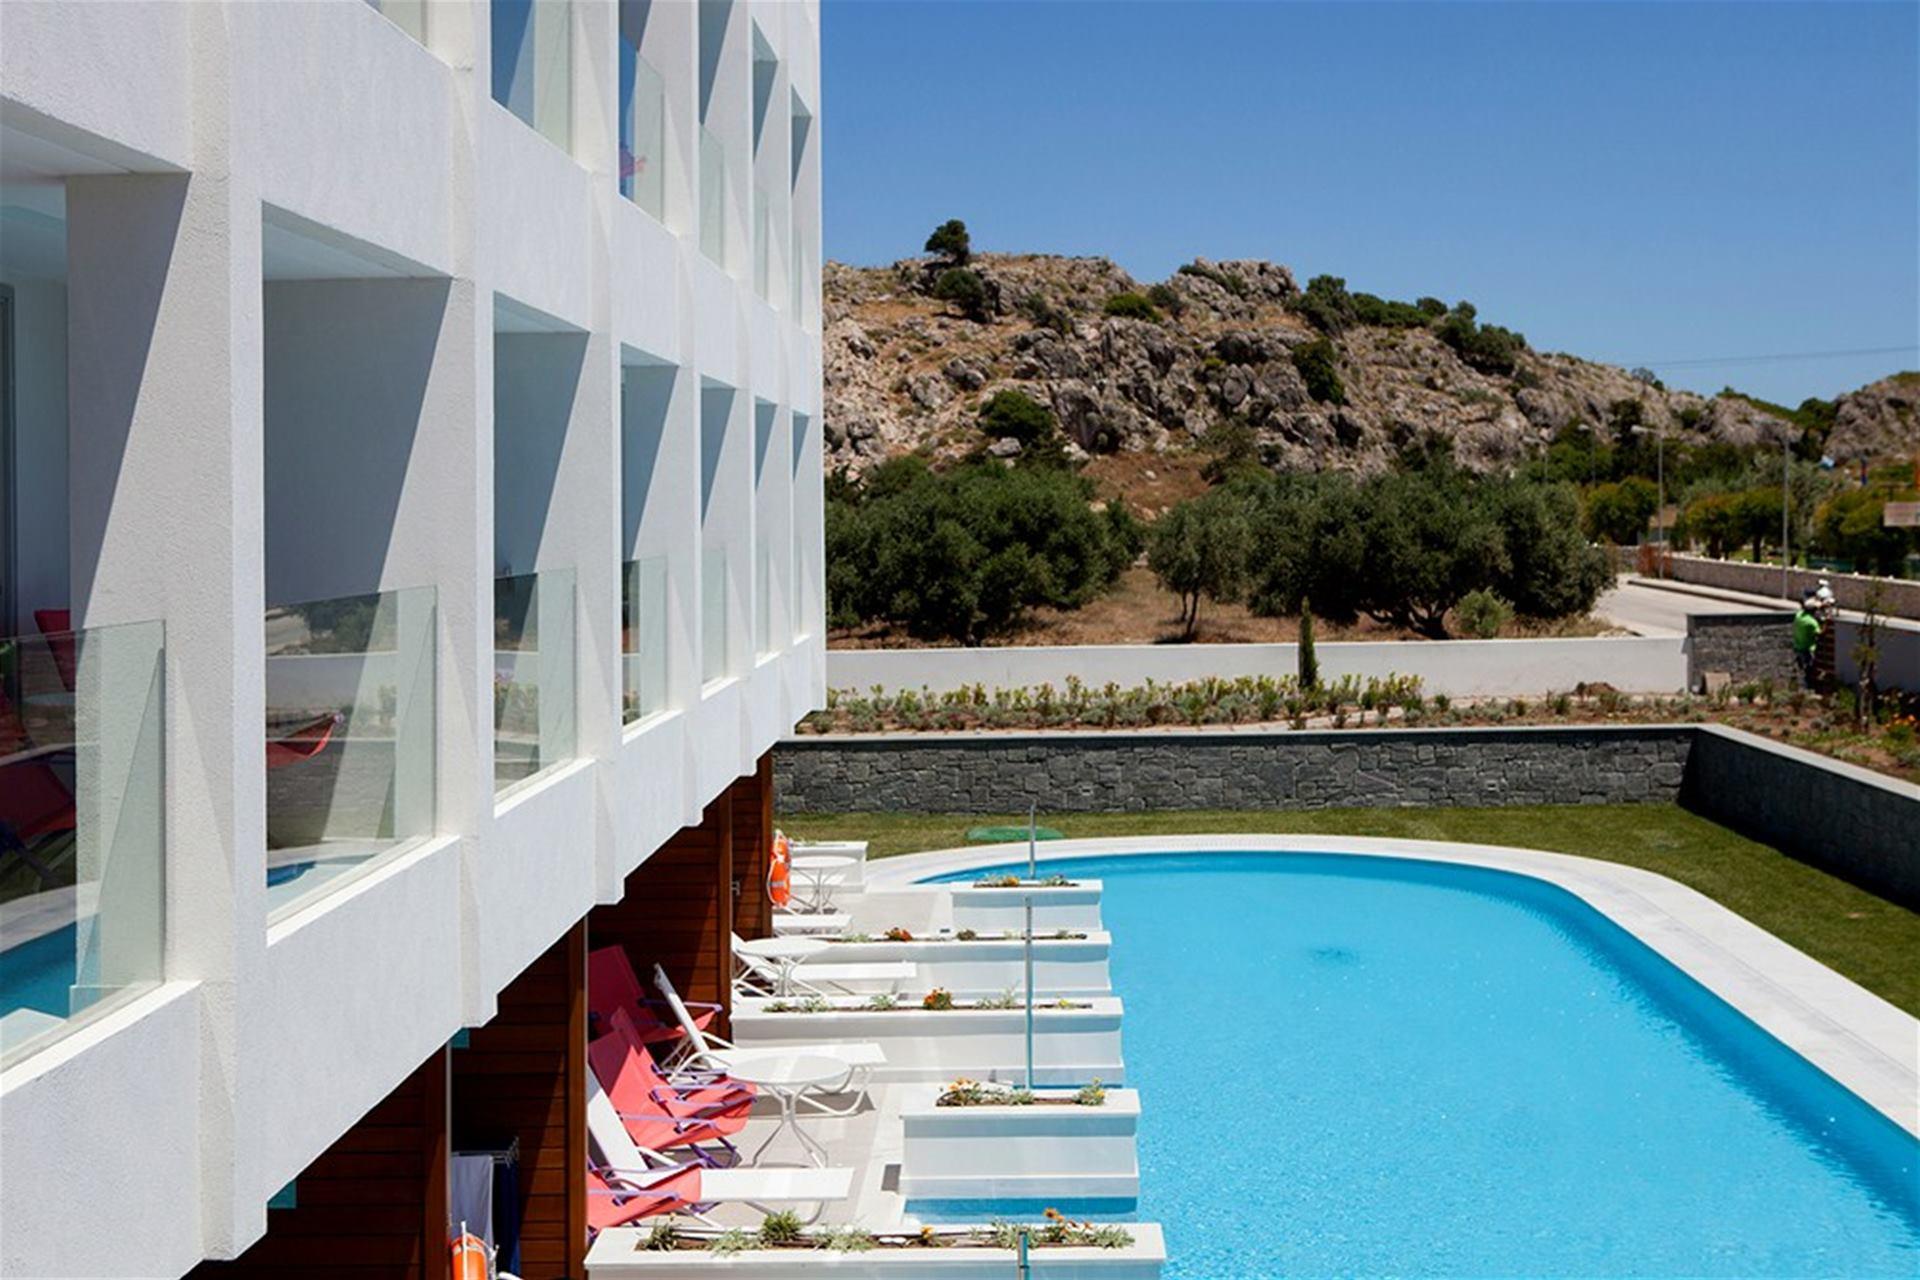 Atlantica Tropical Suites Hotel Atlantica Hotels